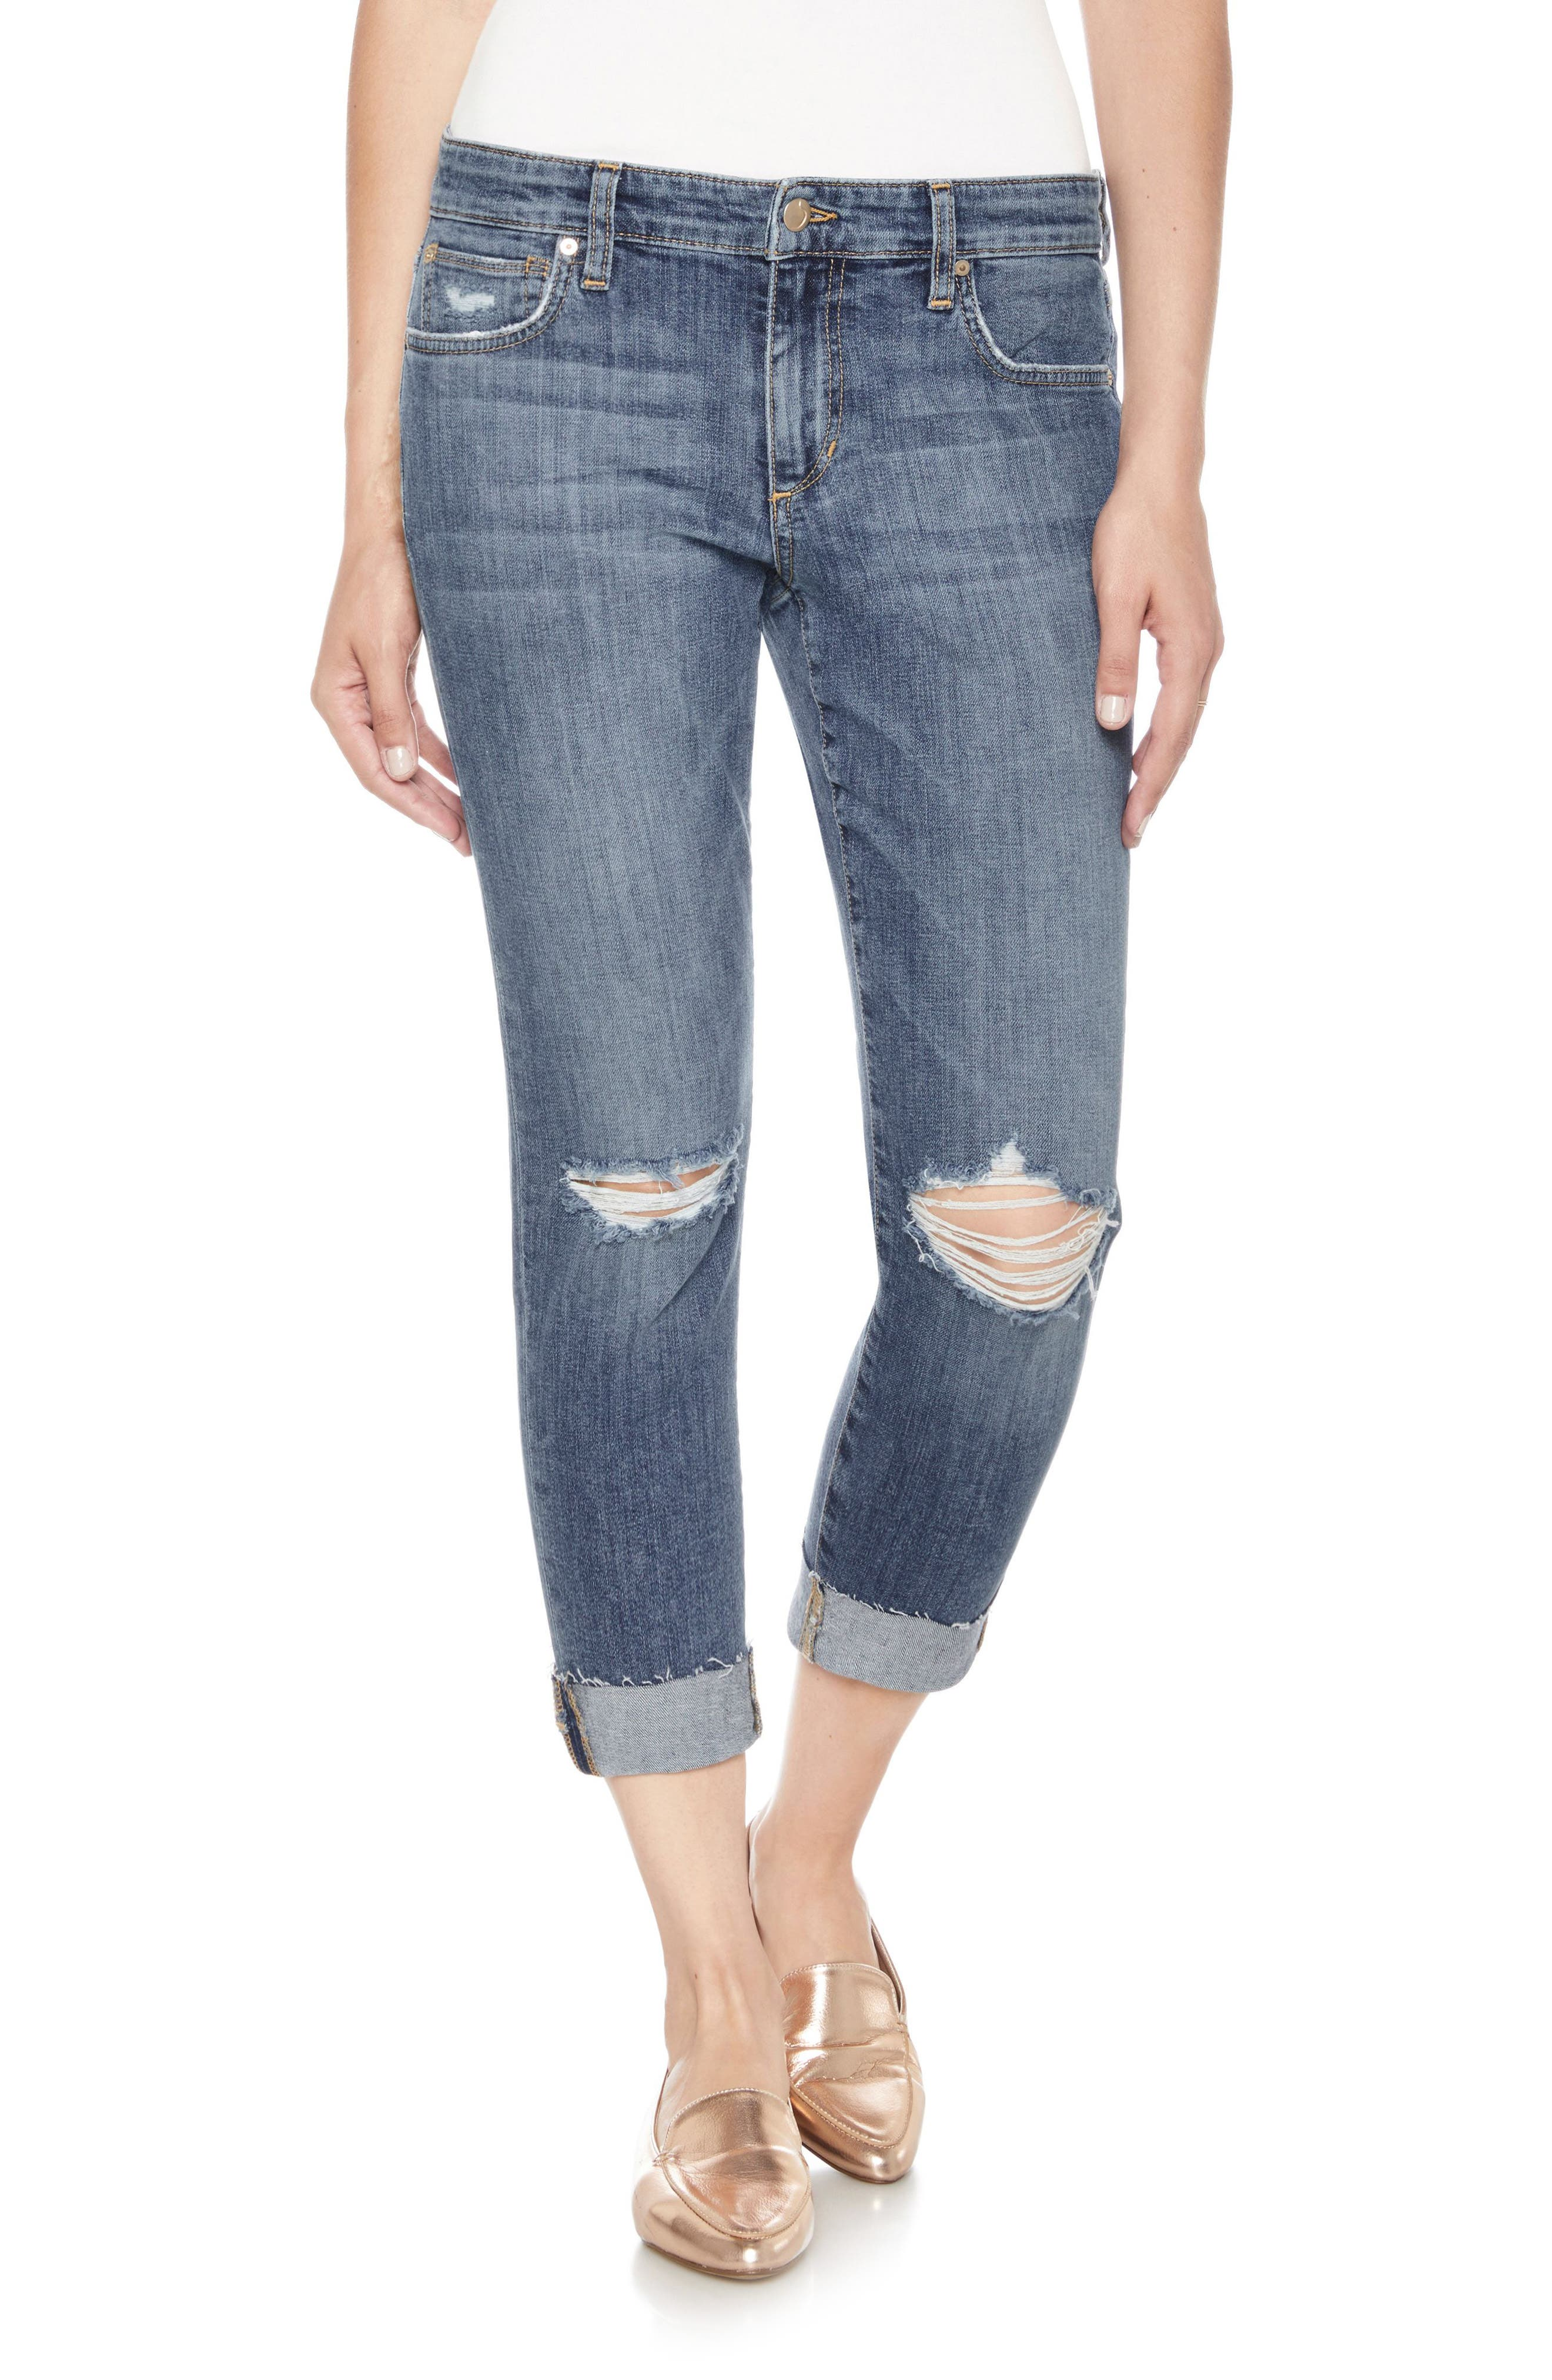 Alternate Image 1 Selected - Joe's Smith Crop Skinny Jeans (Raschell)